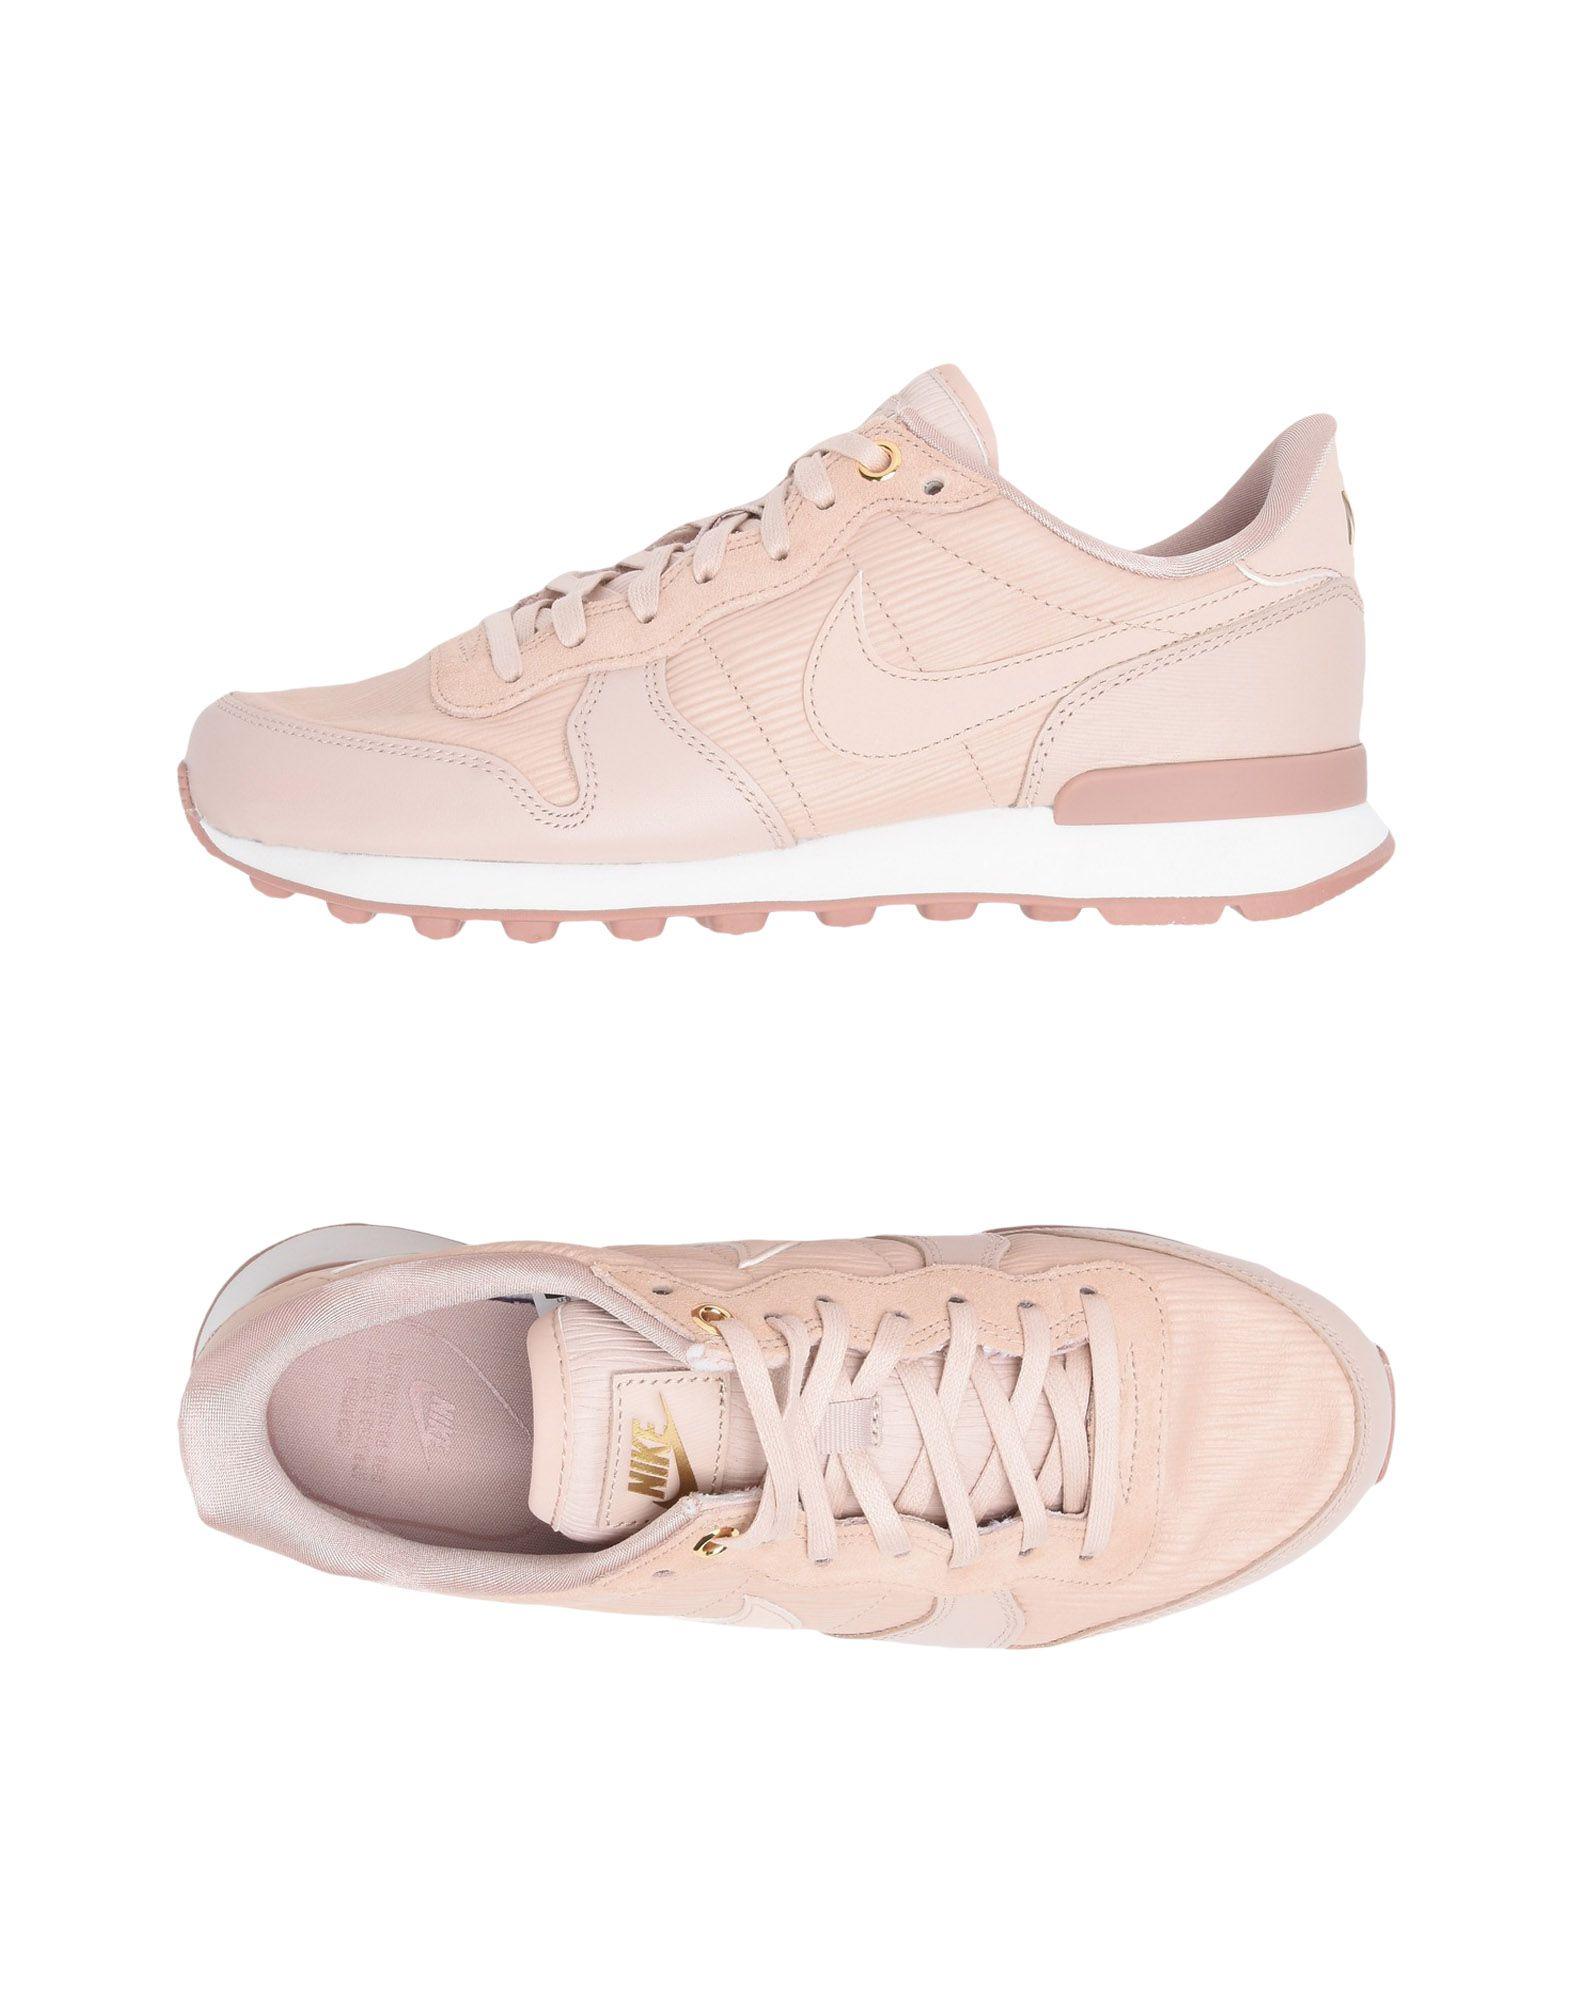 Scarpe da Ginnastica Nike Internationalist Premium - Donna - 11431247WR